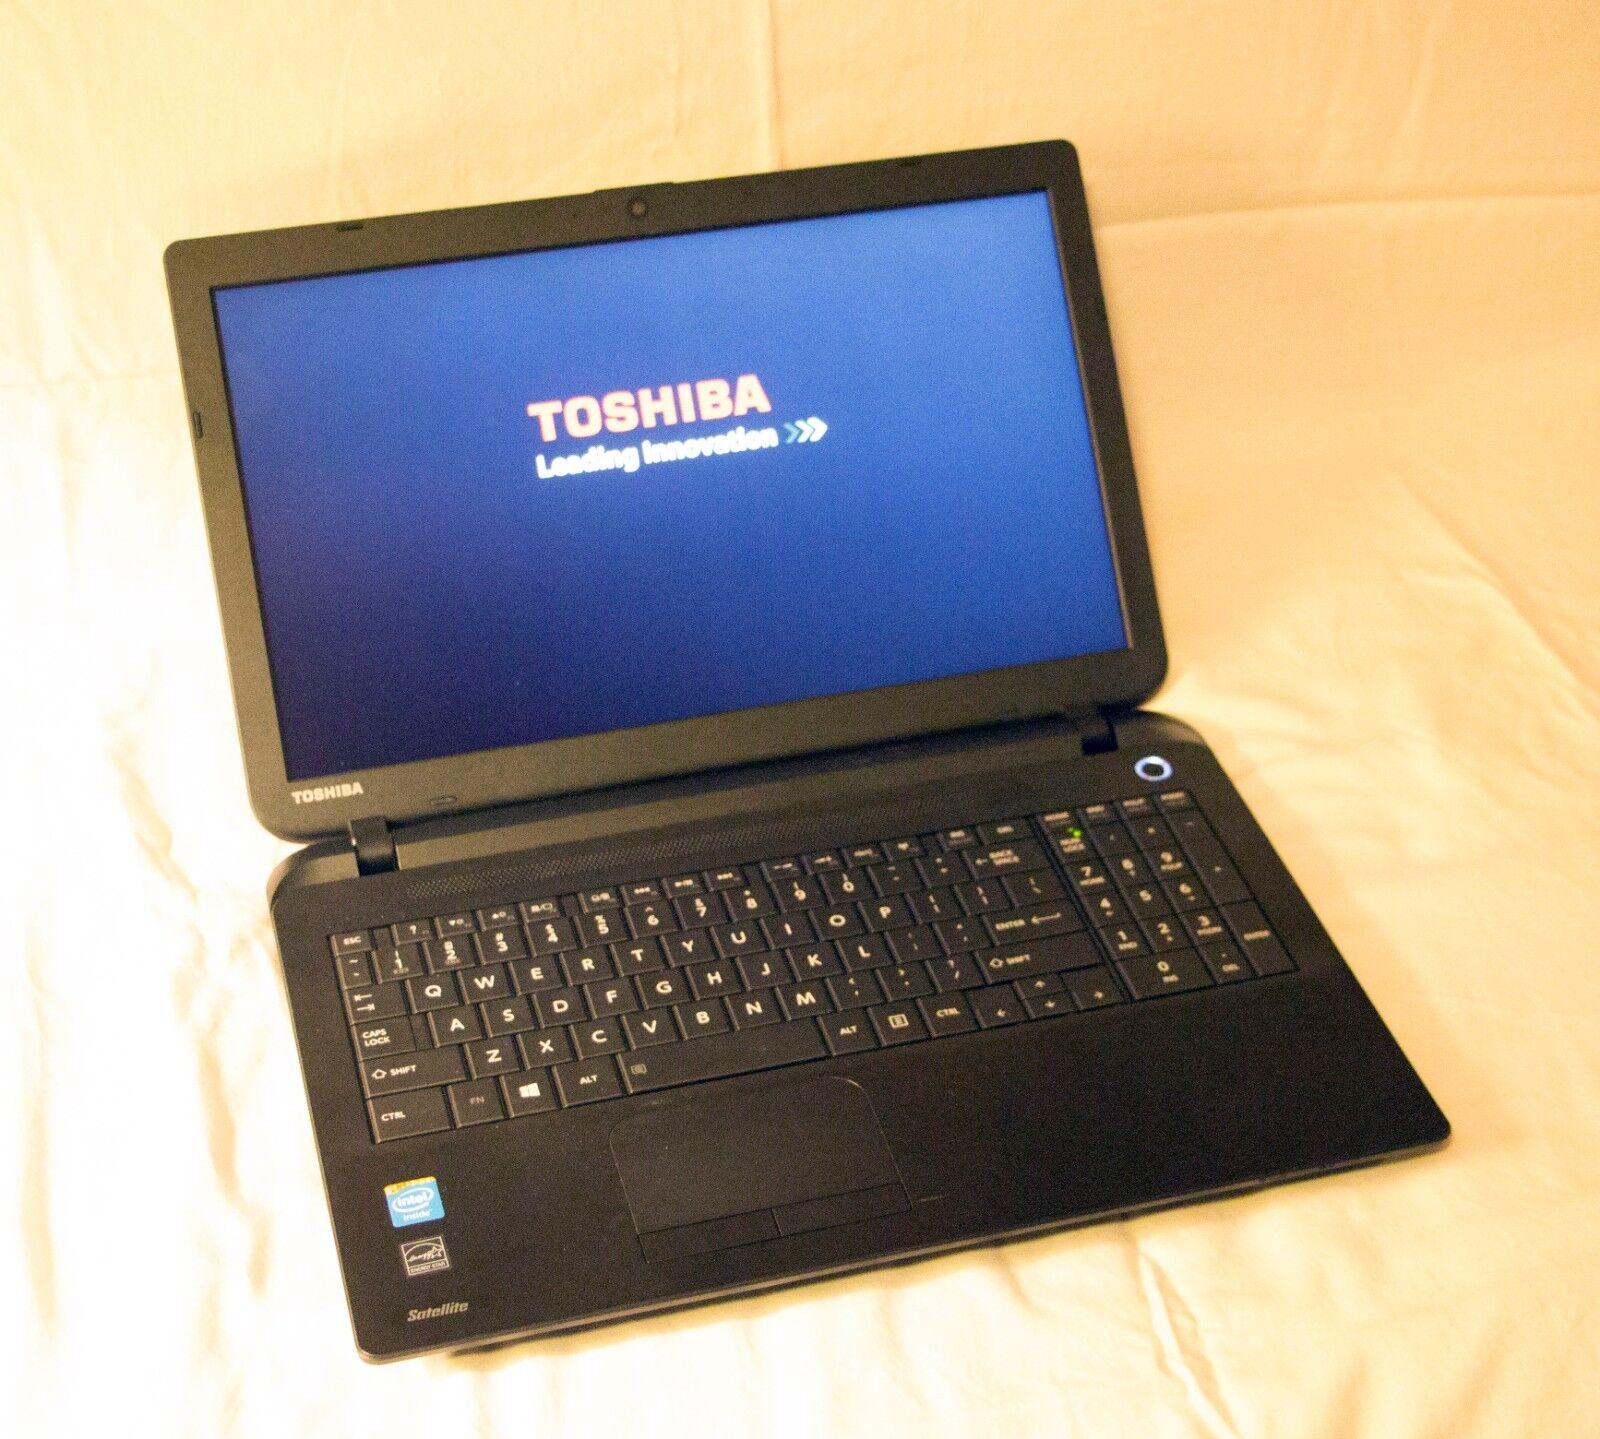 Toshiba Satellite C55-B5299 15.6in 500GB/2.16GHz/2GB w/ Office 2013/Win8 Laptop